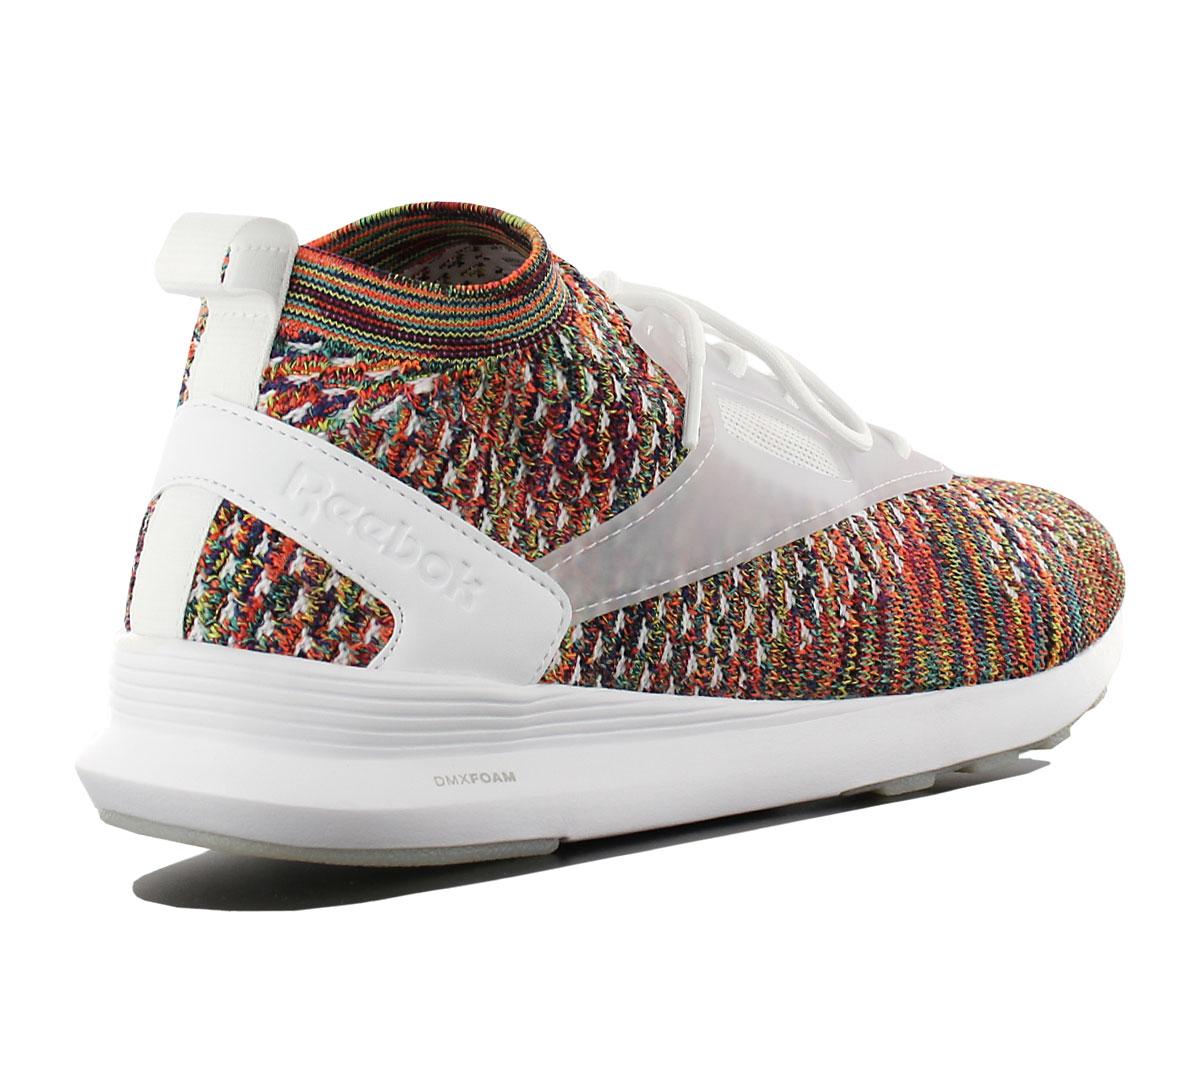 NEW Reebok ZOKU RUNNER ULTK Ultraknit Multi BS7840 Men  s Shoes ... 0d5ede75b